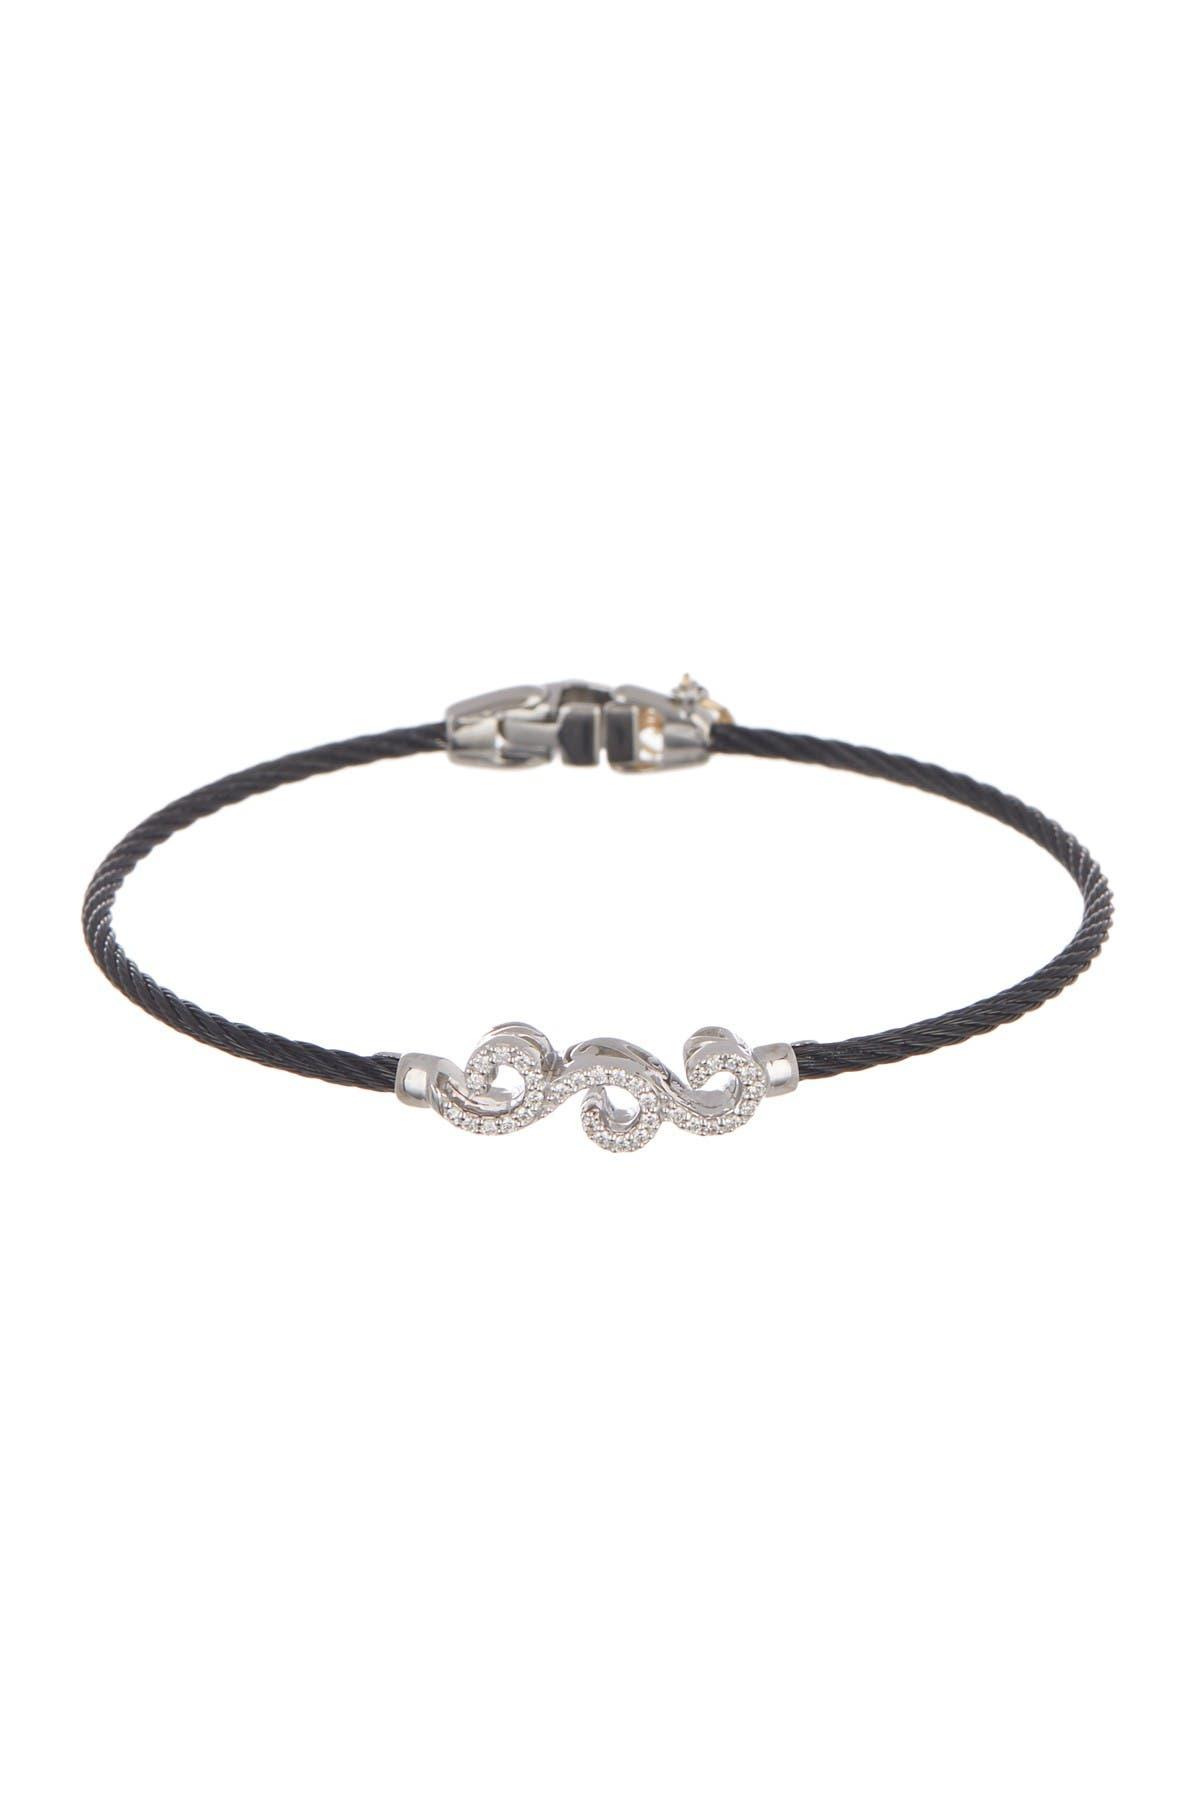 Image of ALOR 18K White Gold & Black Stainless Steel Cable Diamond Filigree Station Bracelet - 0.17 ctw